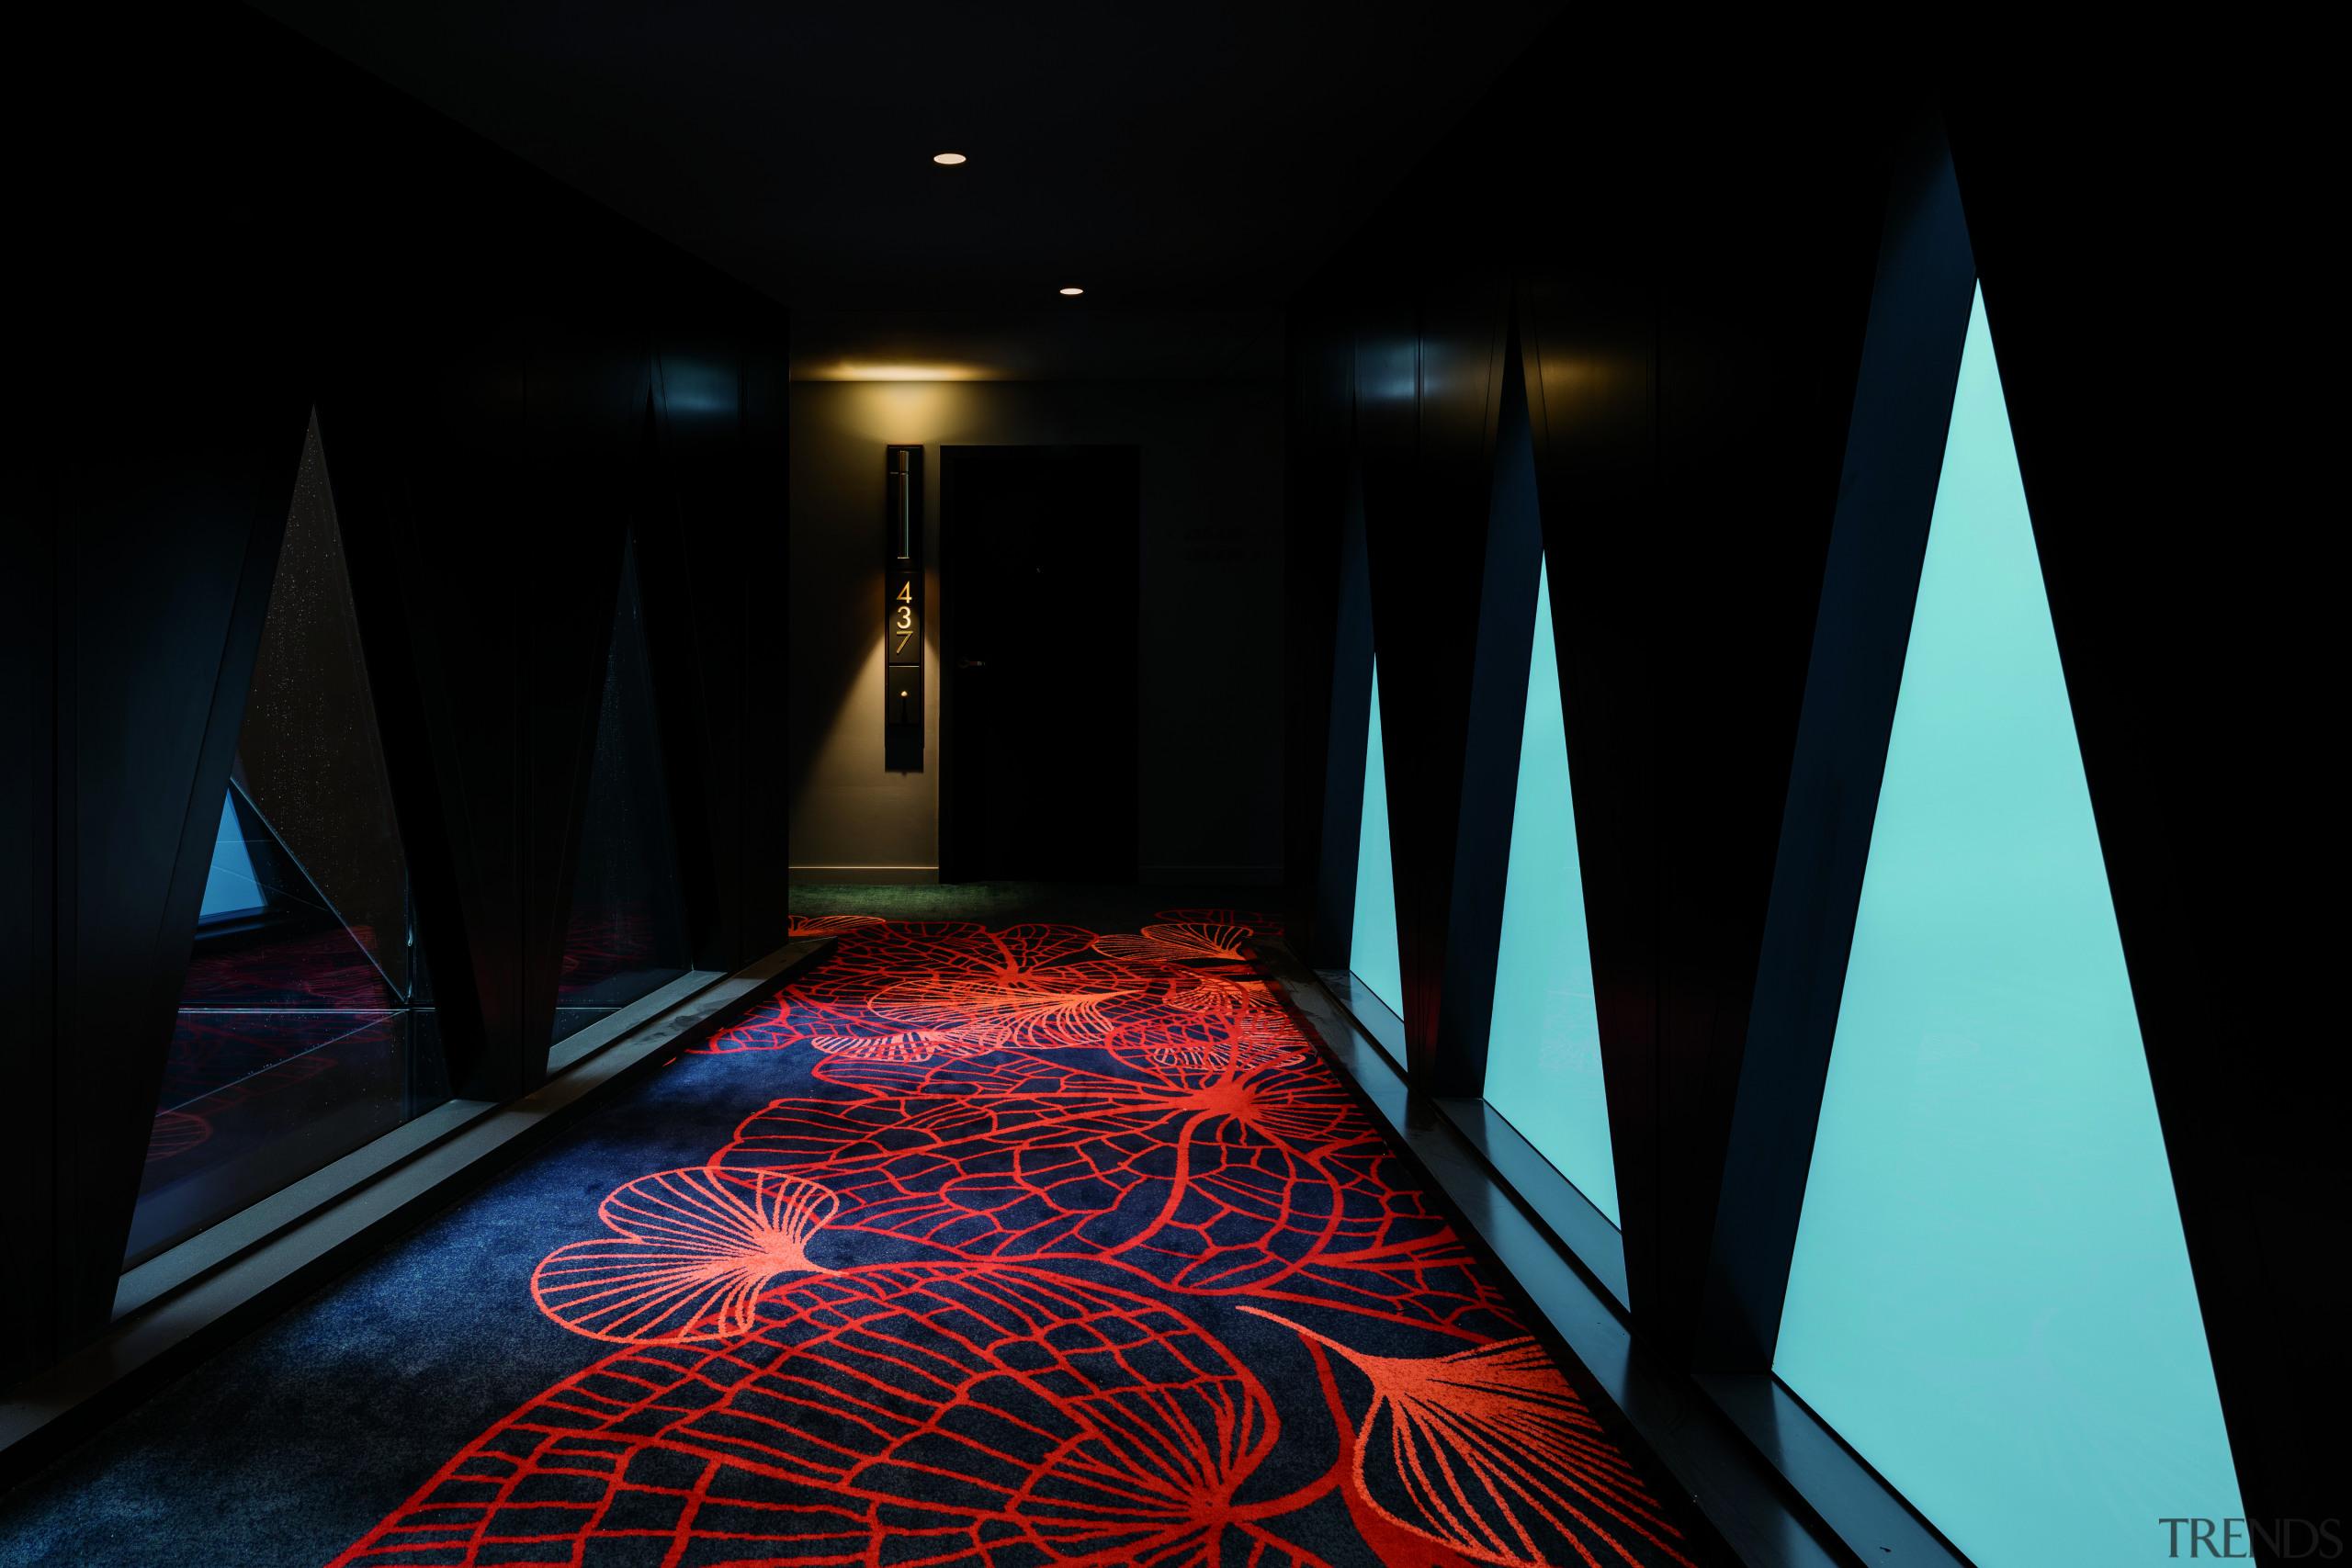 At Sydney's West Hotel, custom woven carpets evoke architecture, darkness, light, lighting, black